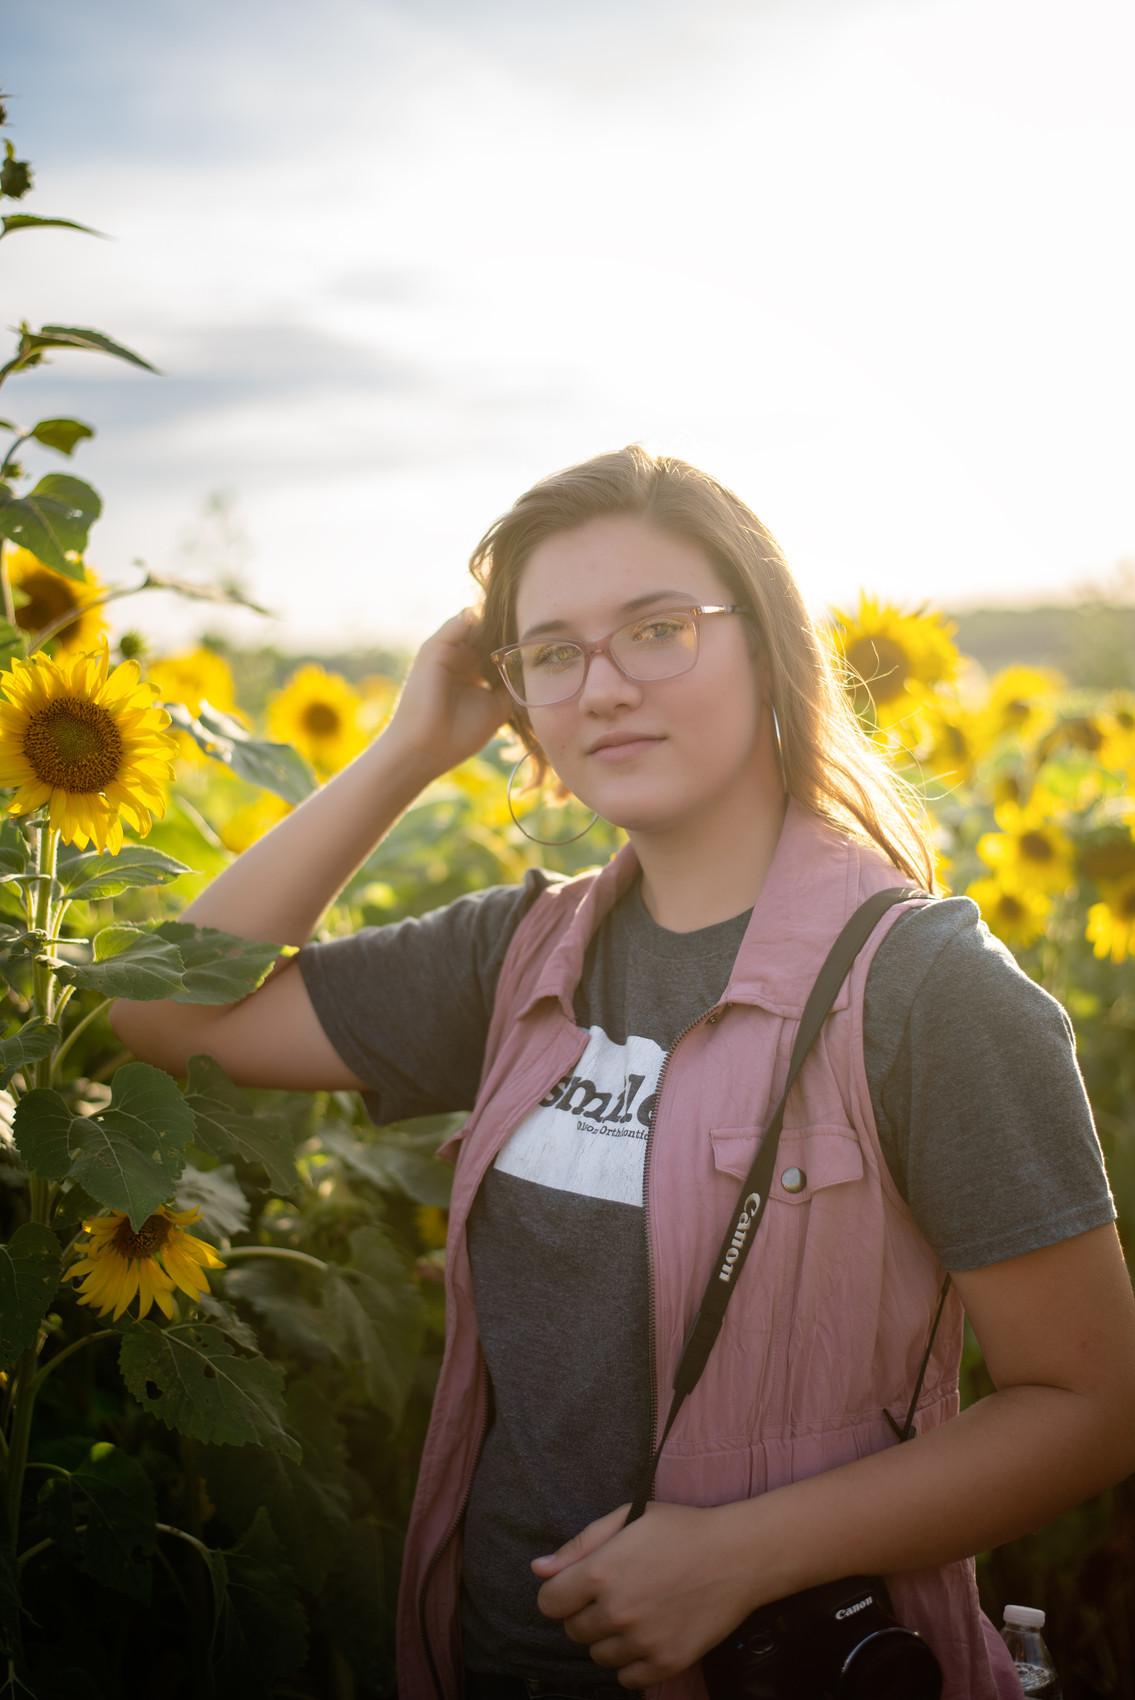 teen posing in sunflower field at Nelson Produce in Valley, NE